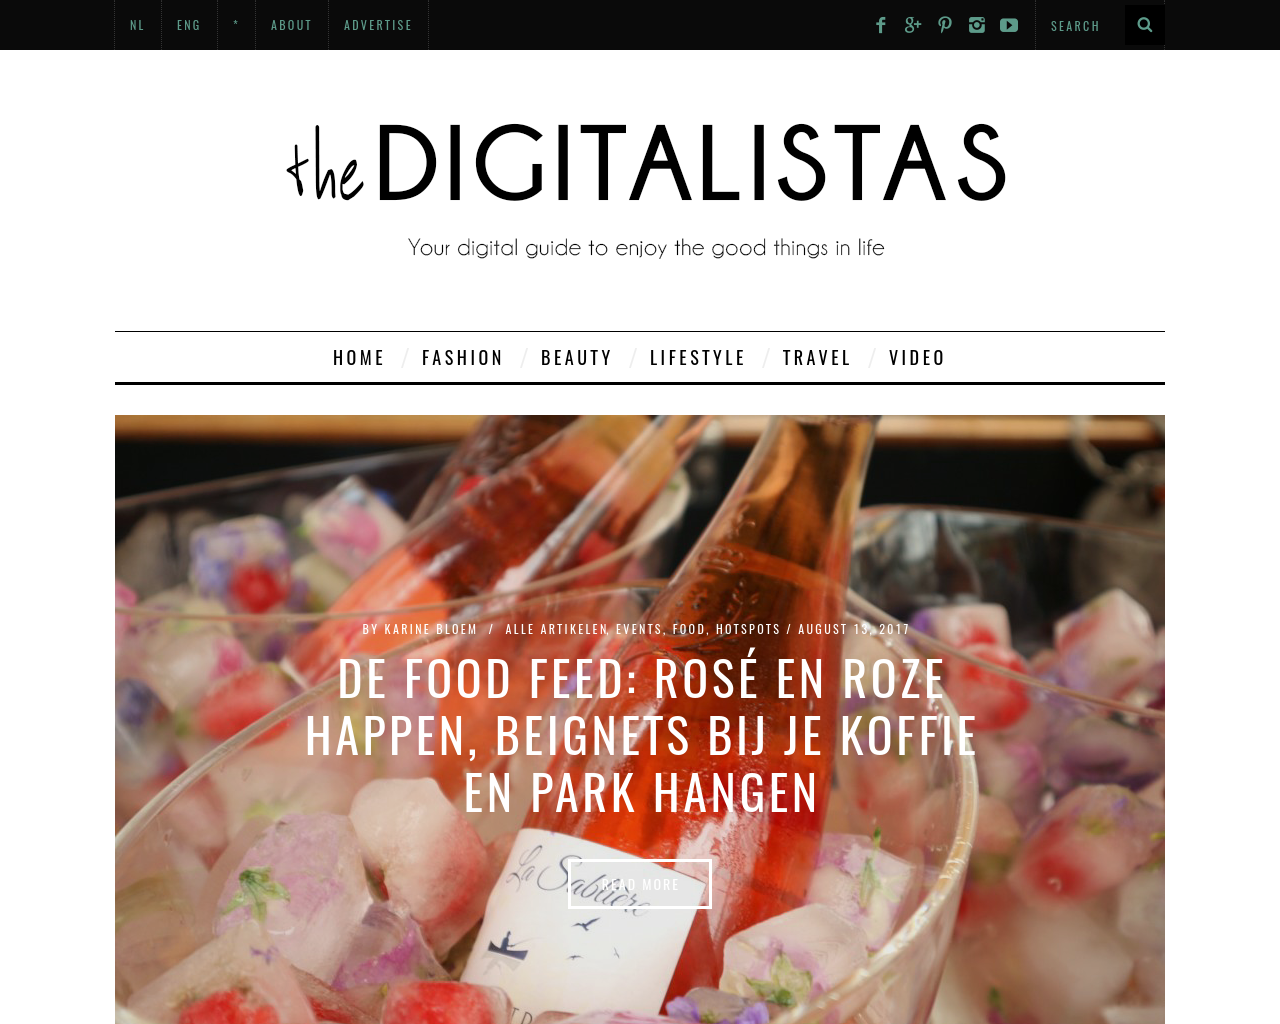 The-Digitalistas-Advertising-Reviews-Pricing